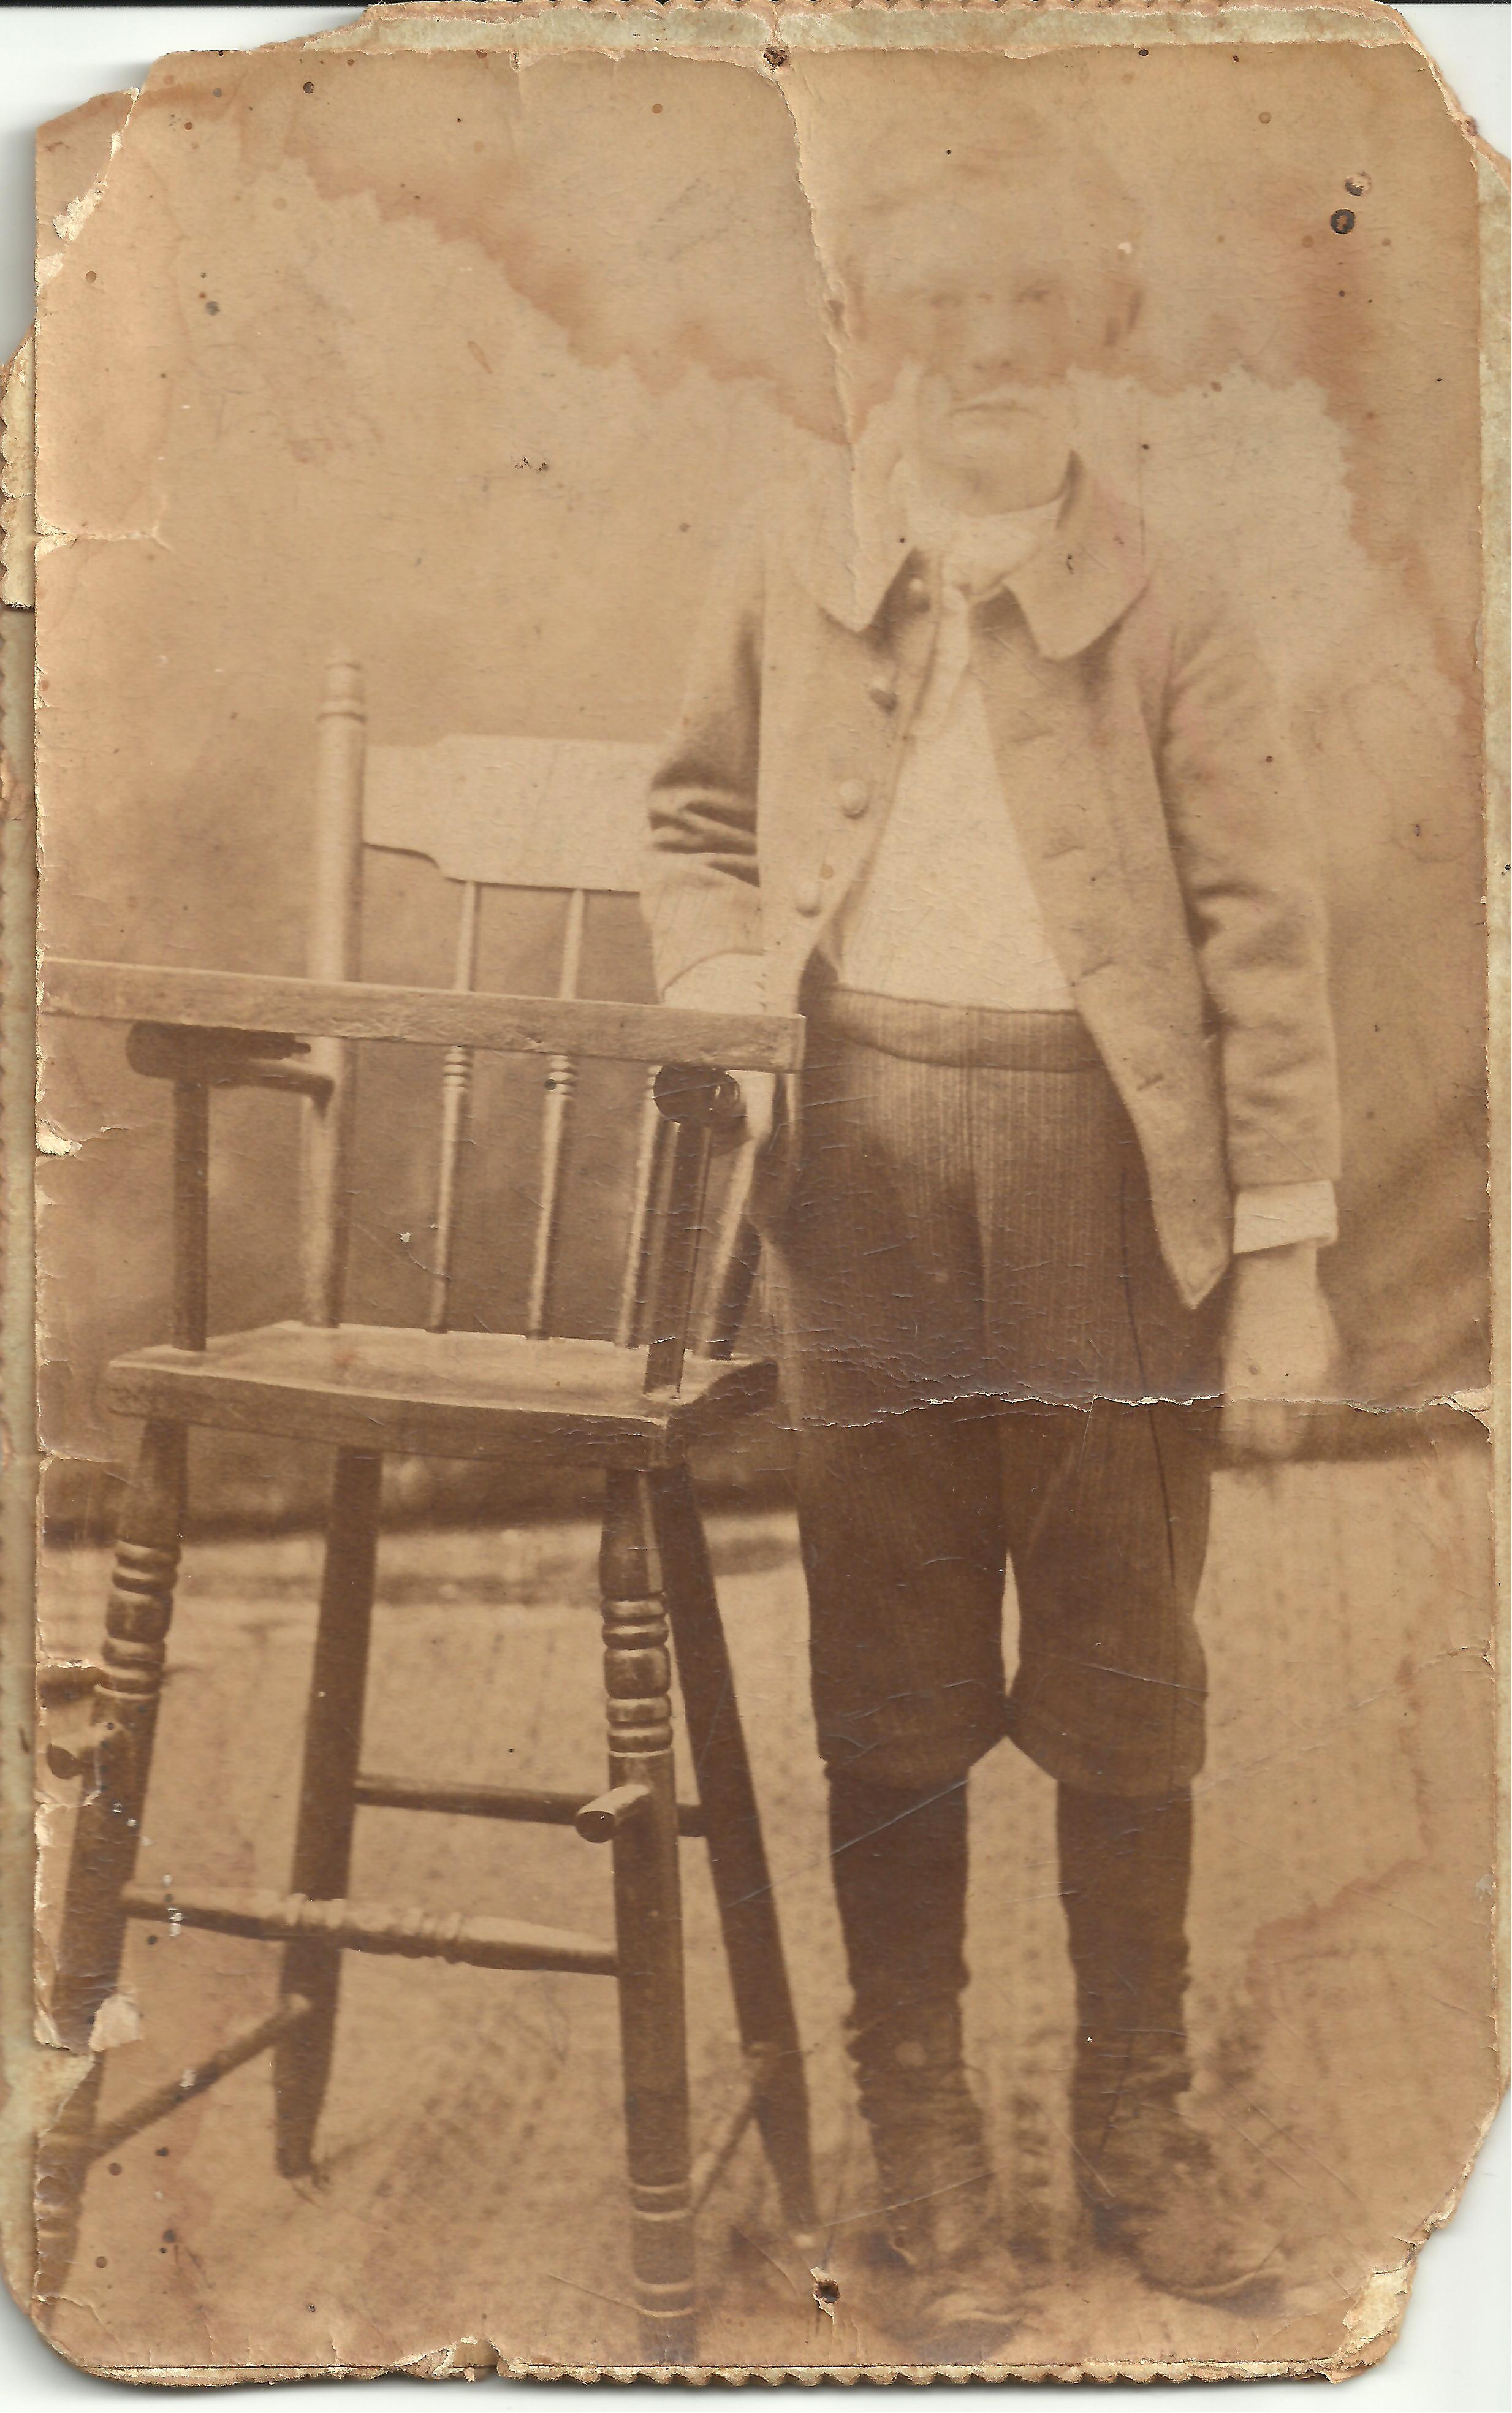 Buster Clayton Hutson